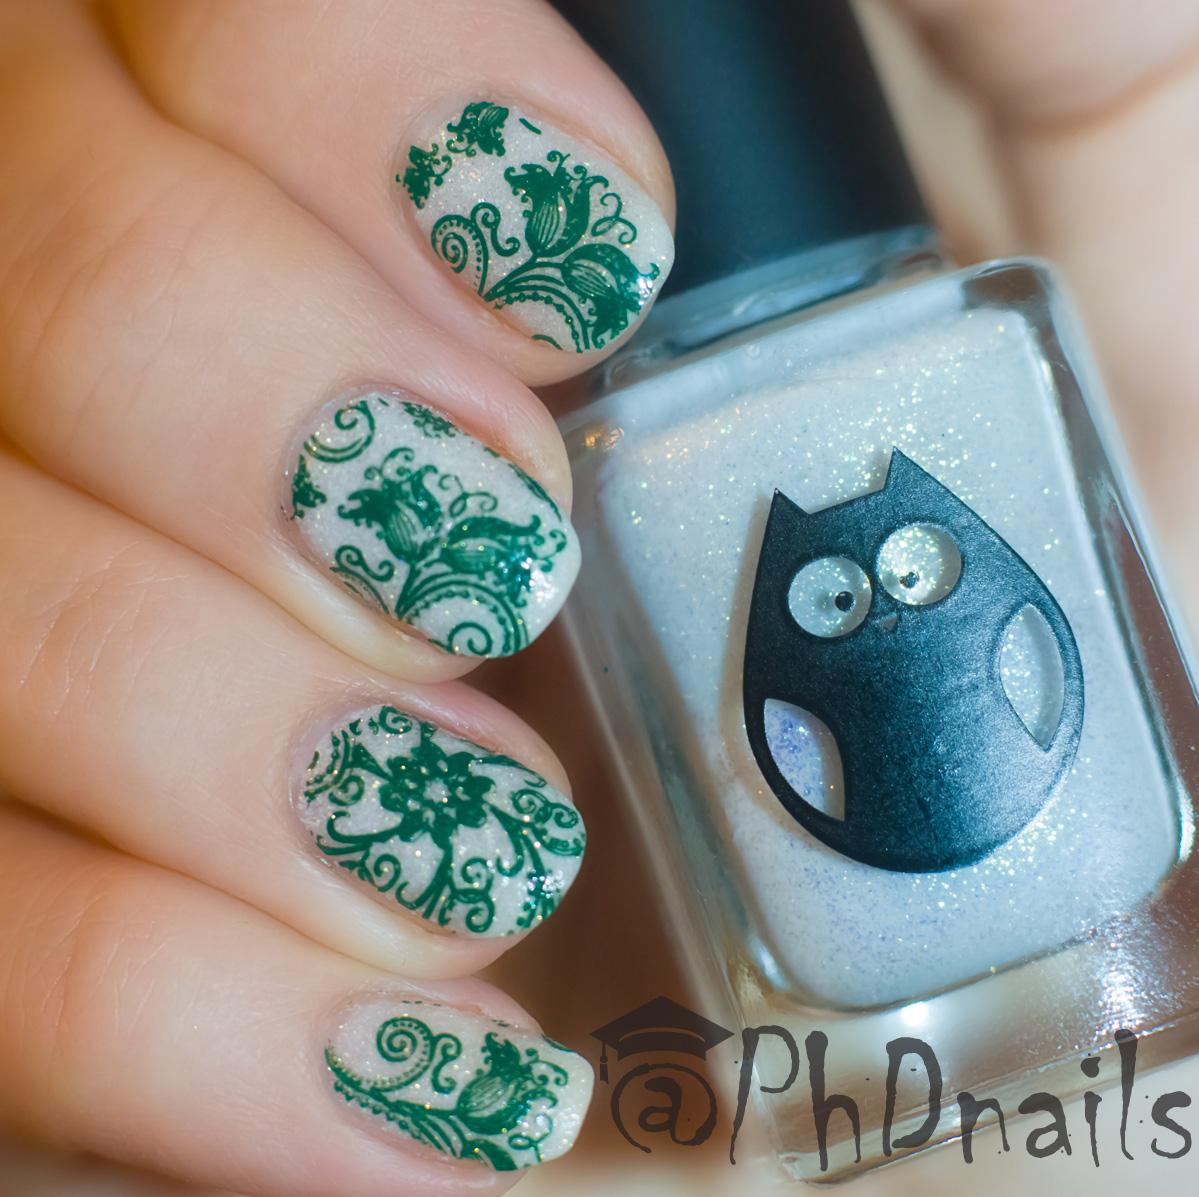 PhD nails: 40 great nail art ideas: Fashion inspired stamping \